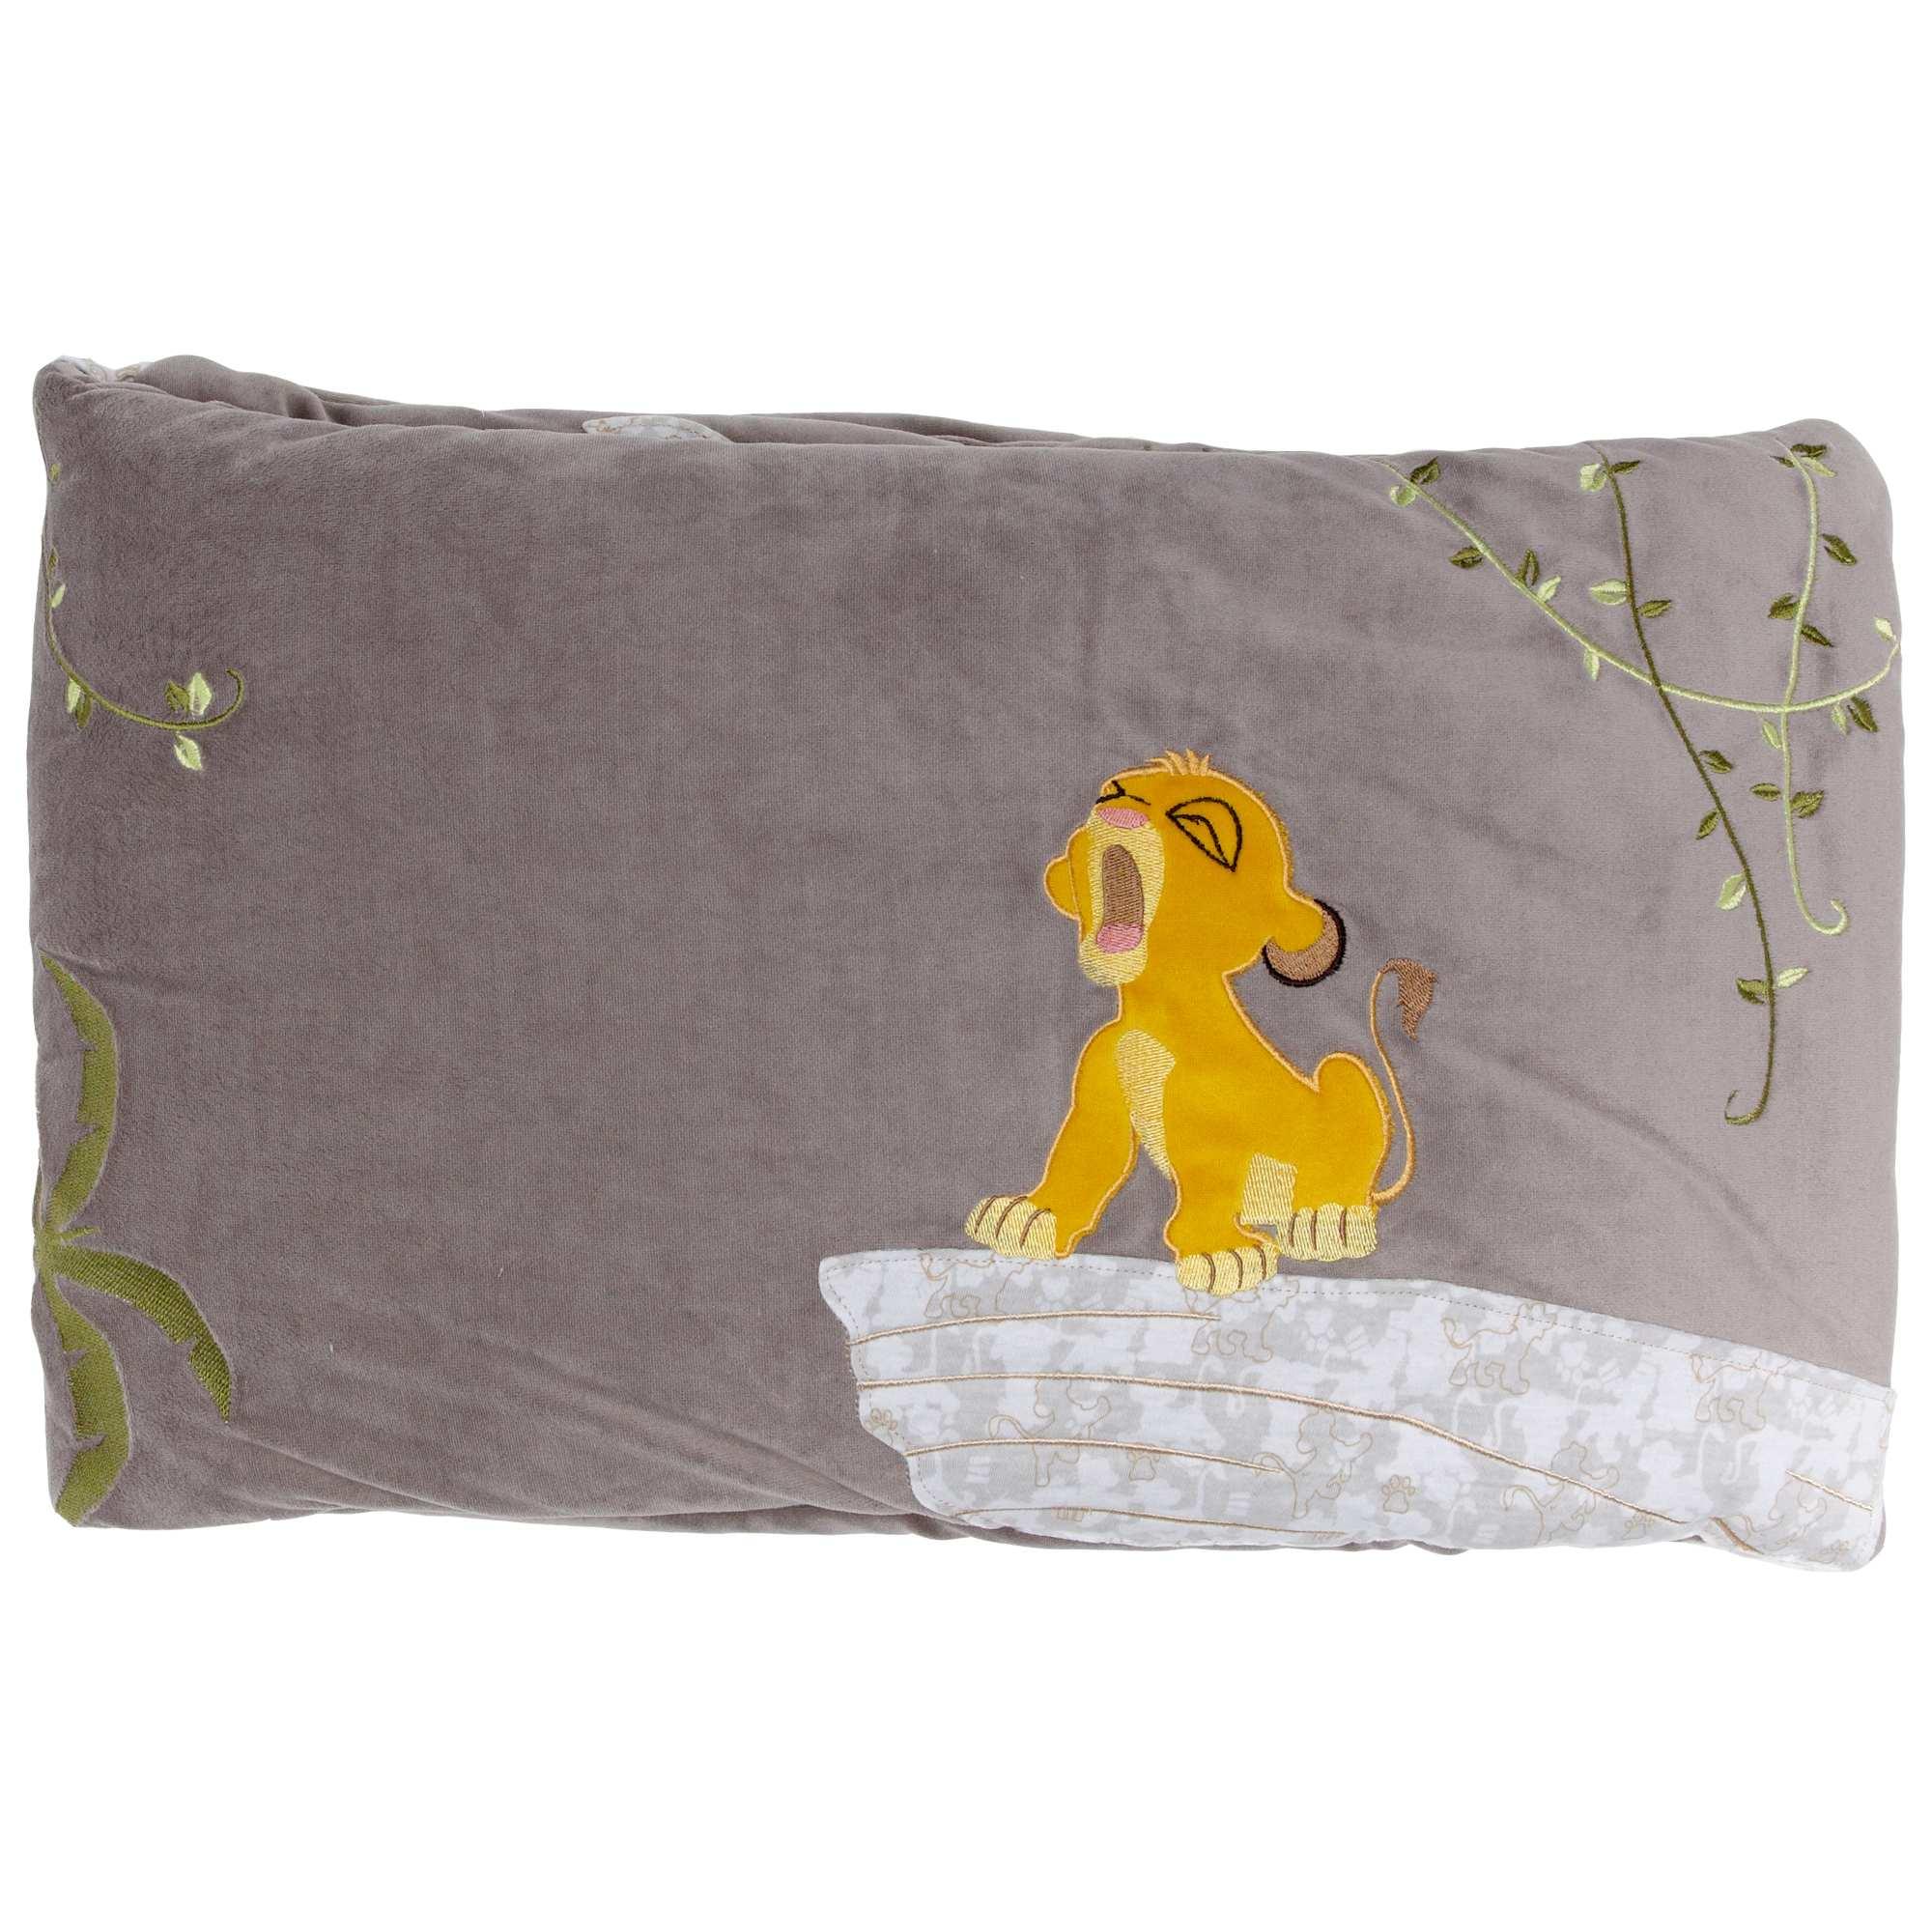 La Nouvelle Collection Disney Baby De Kiabi Dumbo Simba